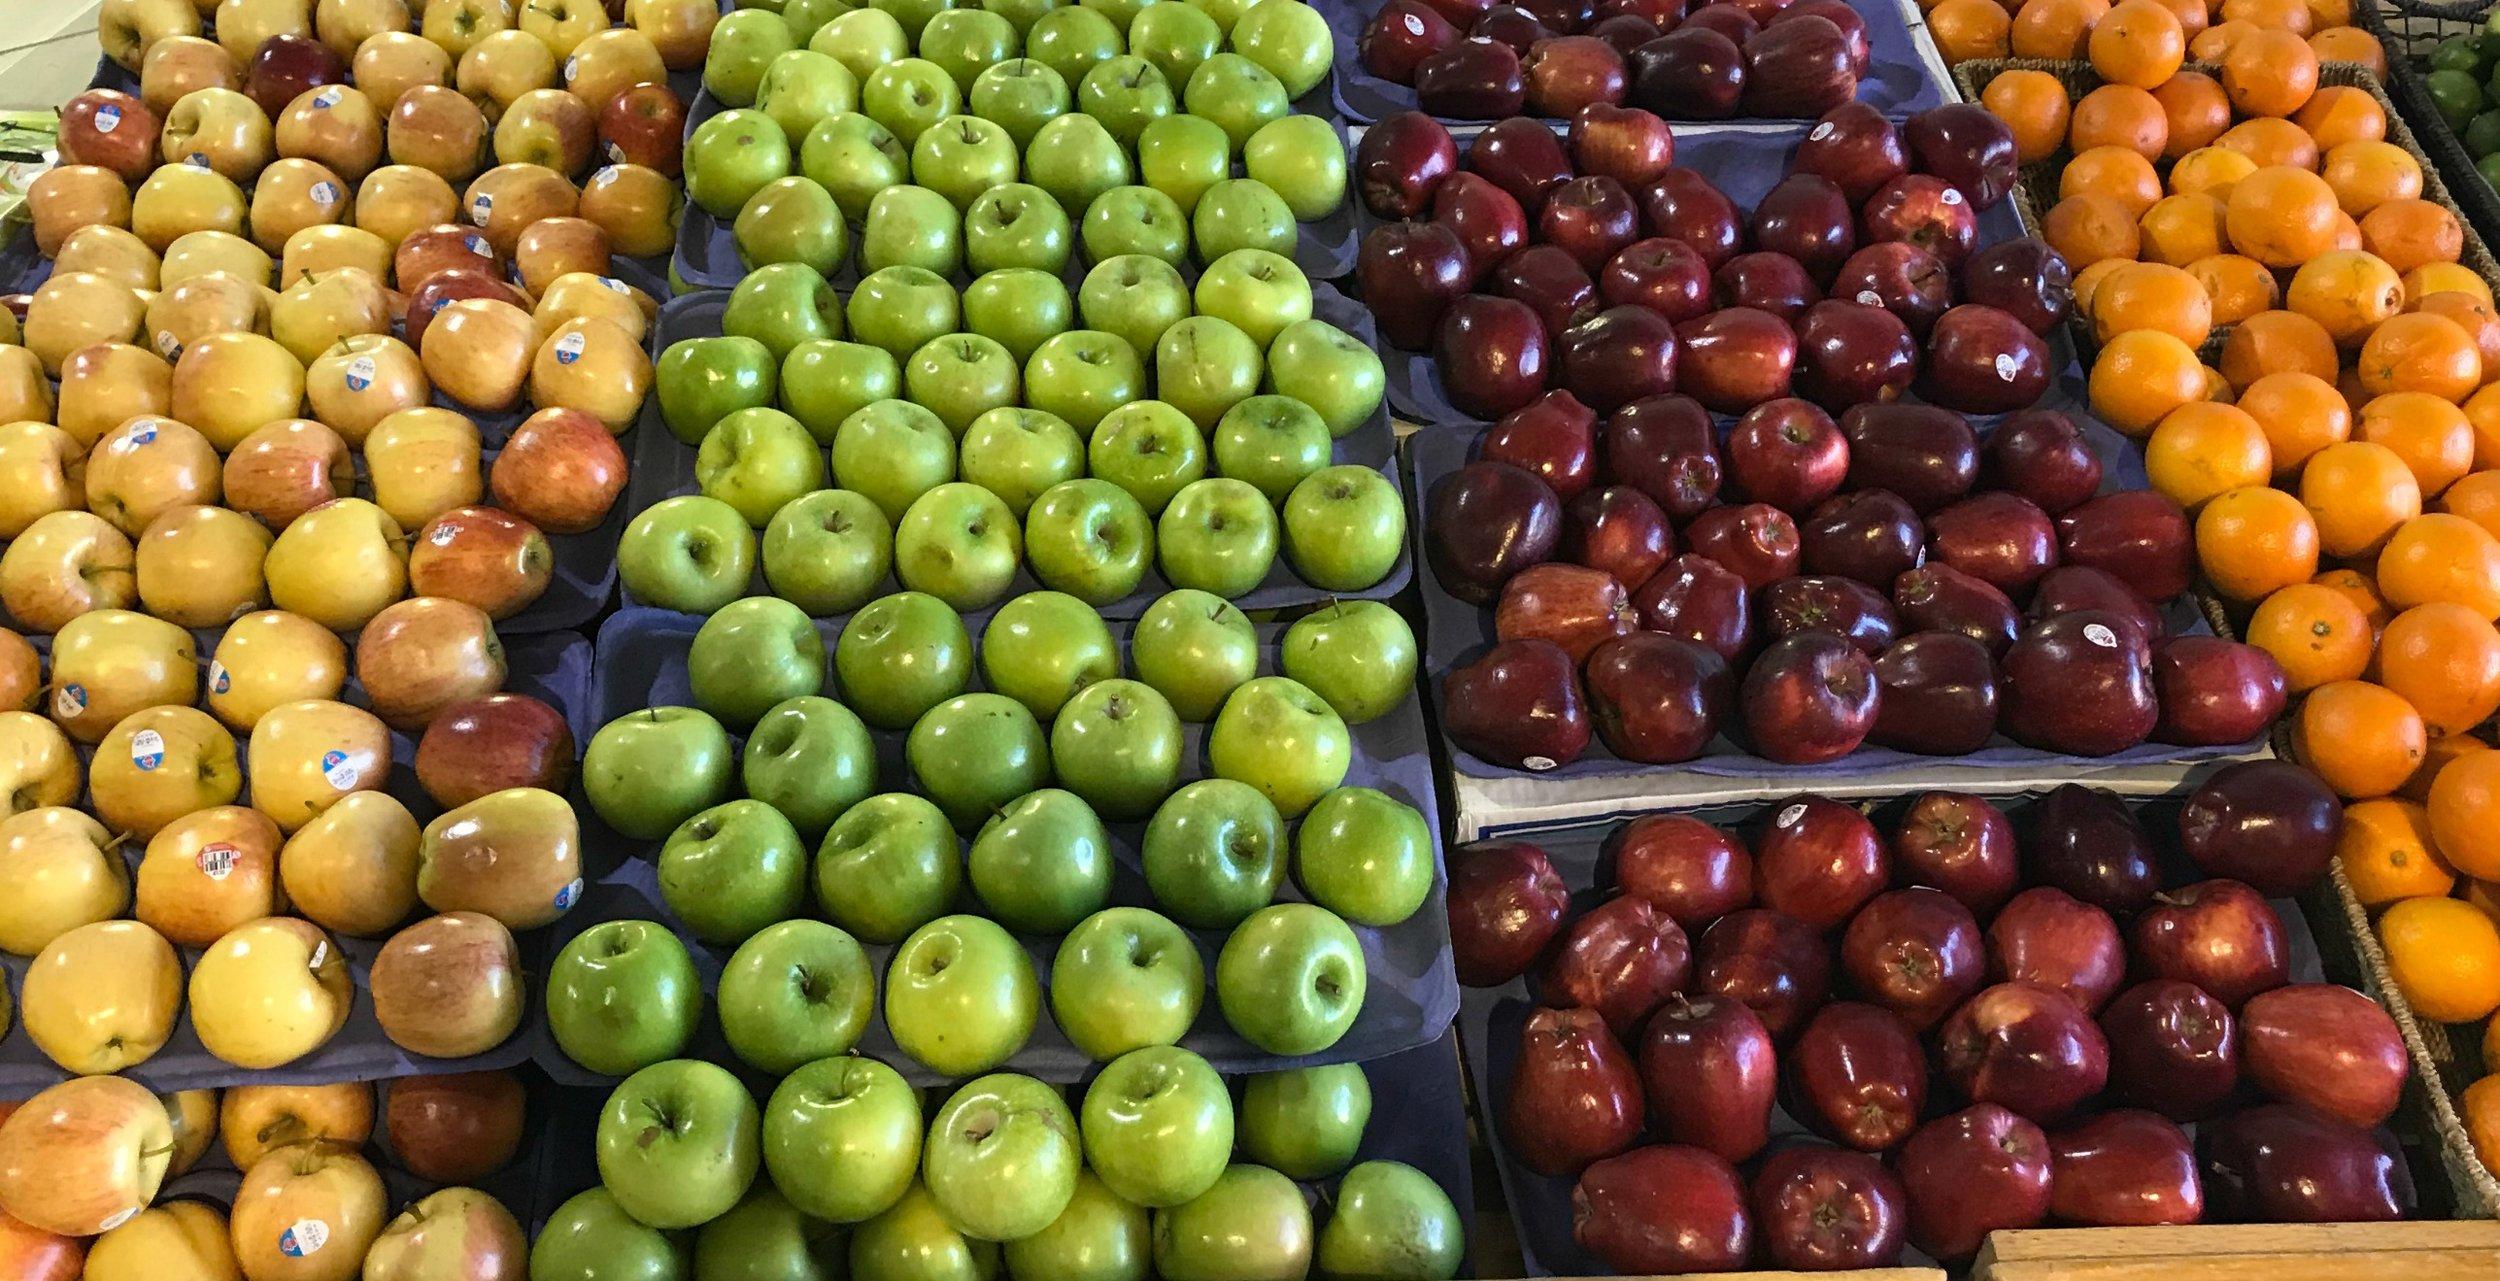 apples and oranges cropped.jpg